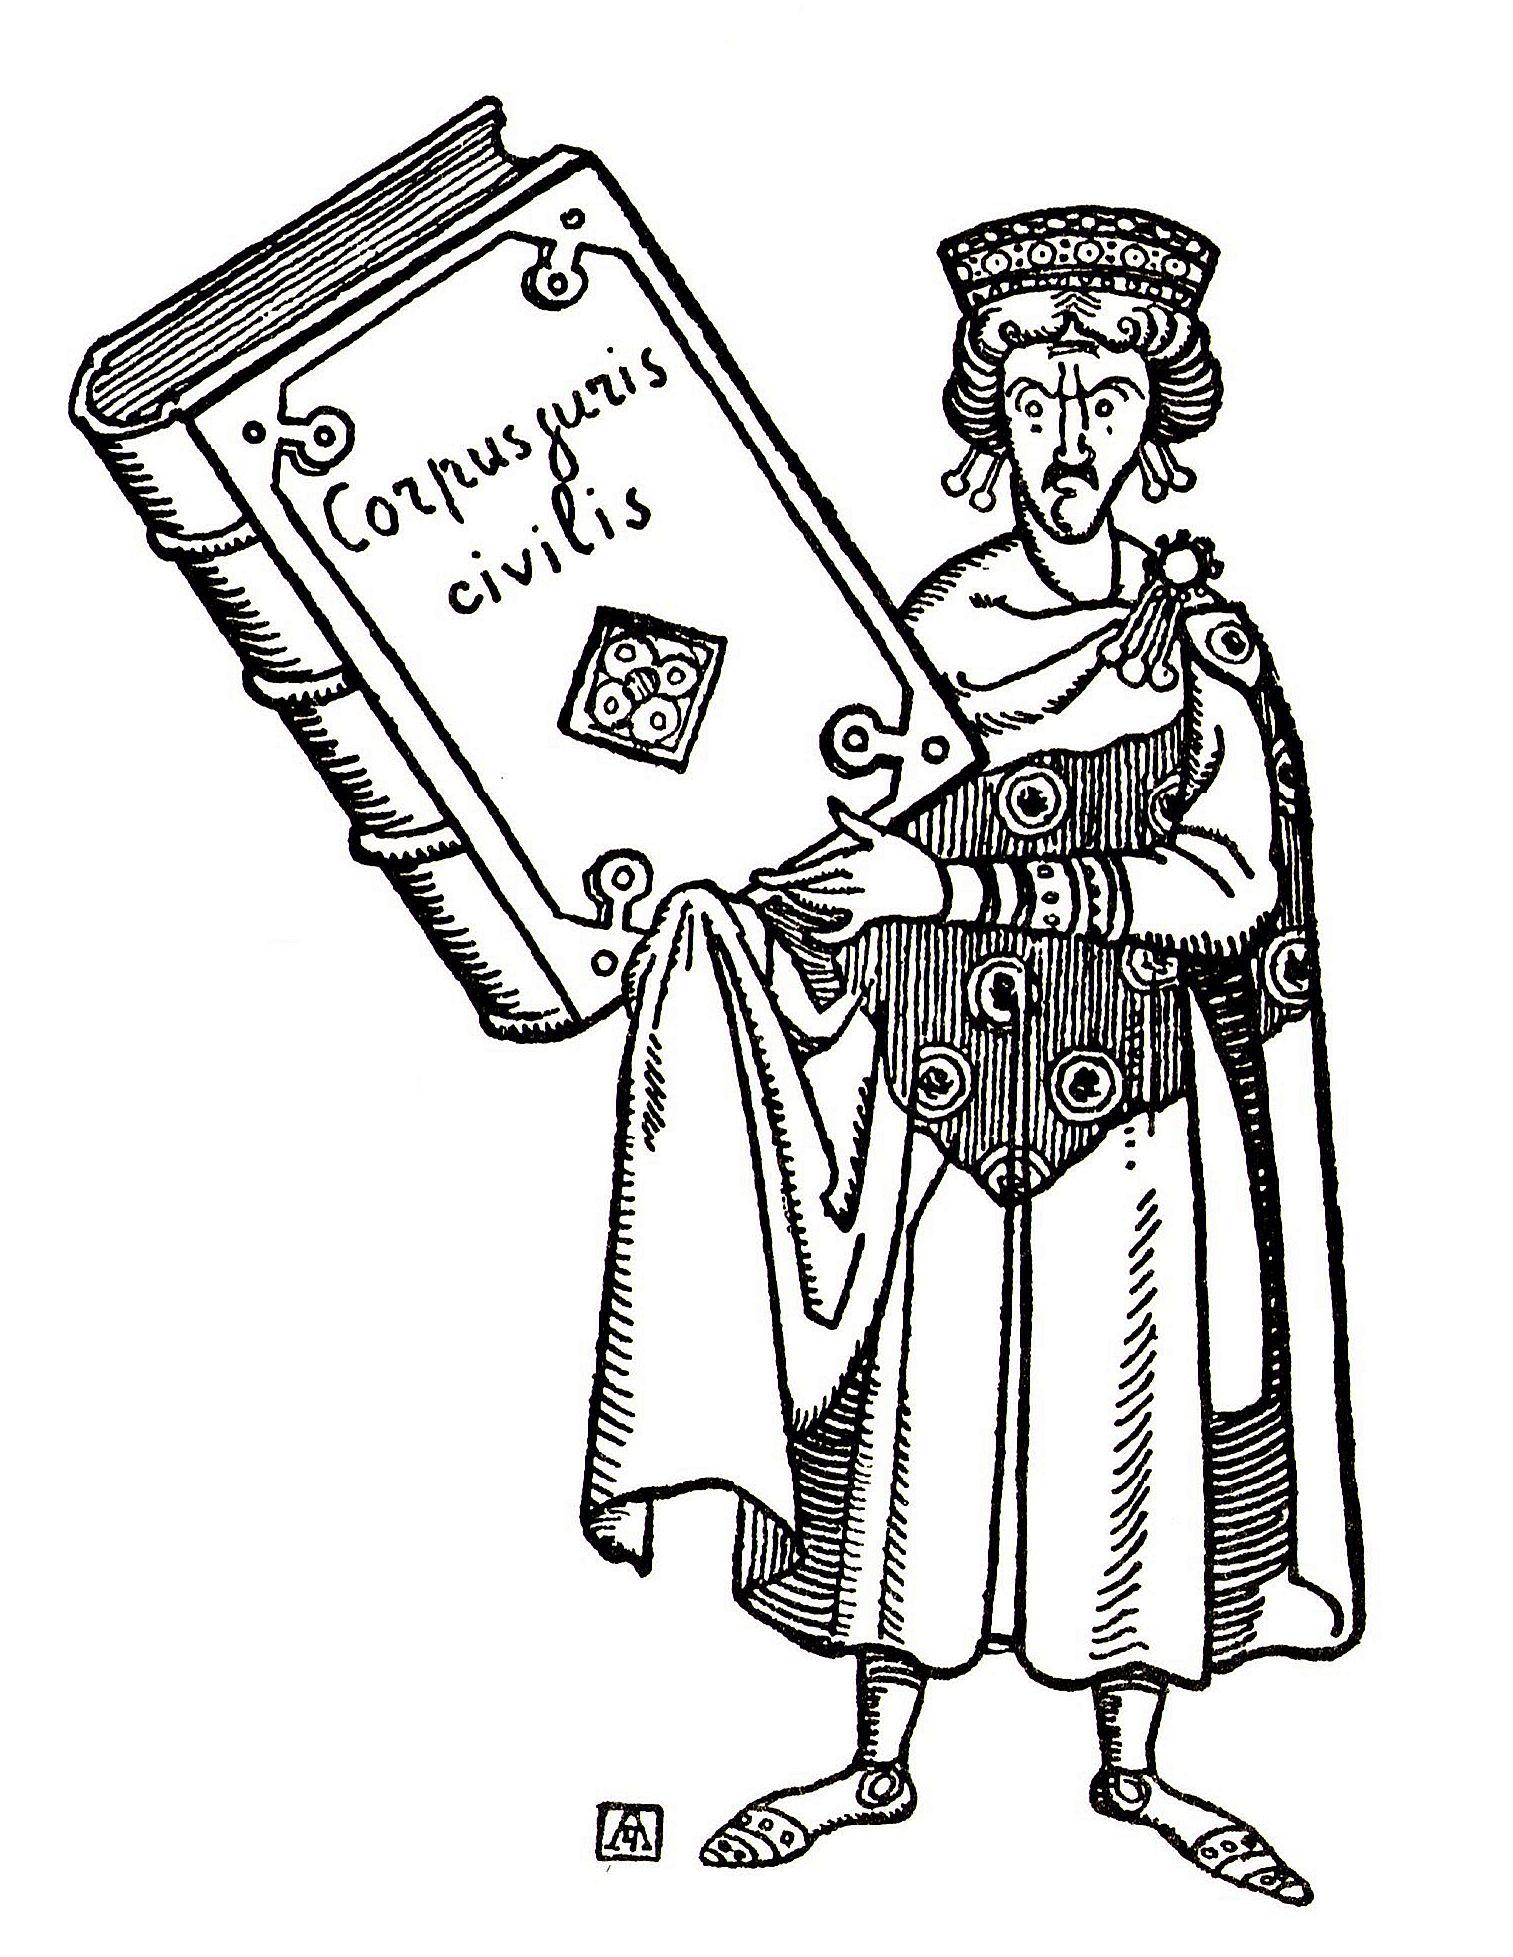 Corpus Juris Civilis Law: Created by a Byzantine Emperor